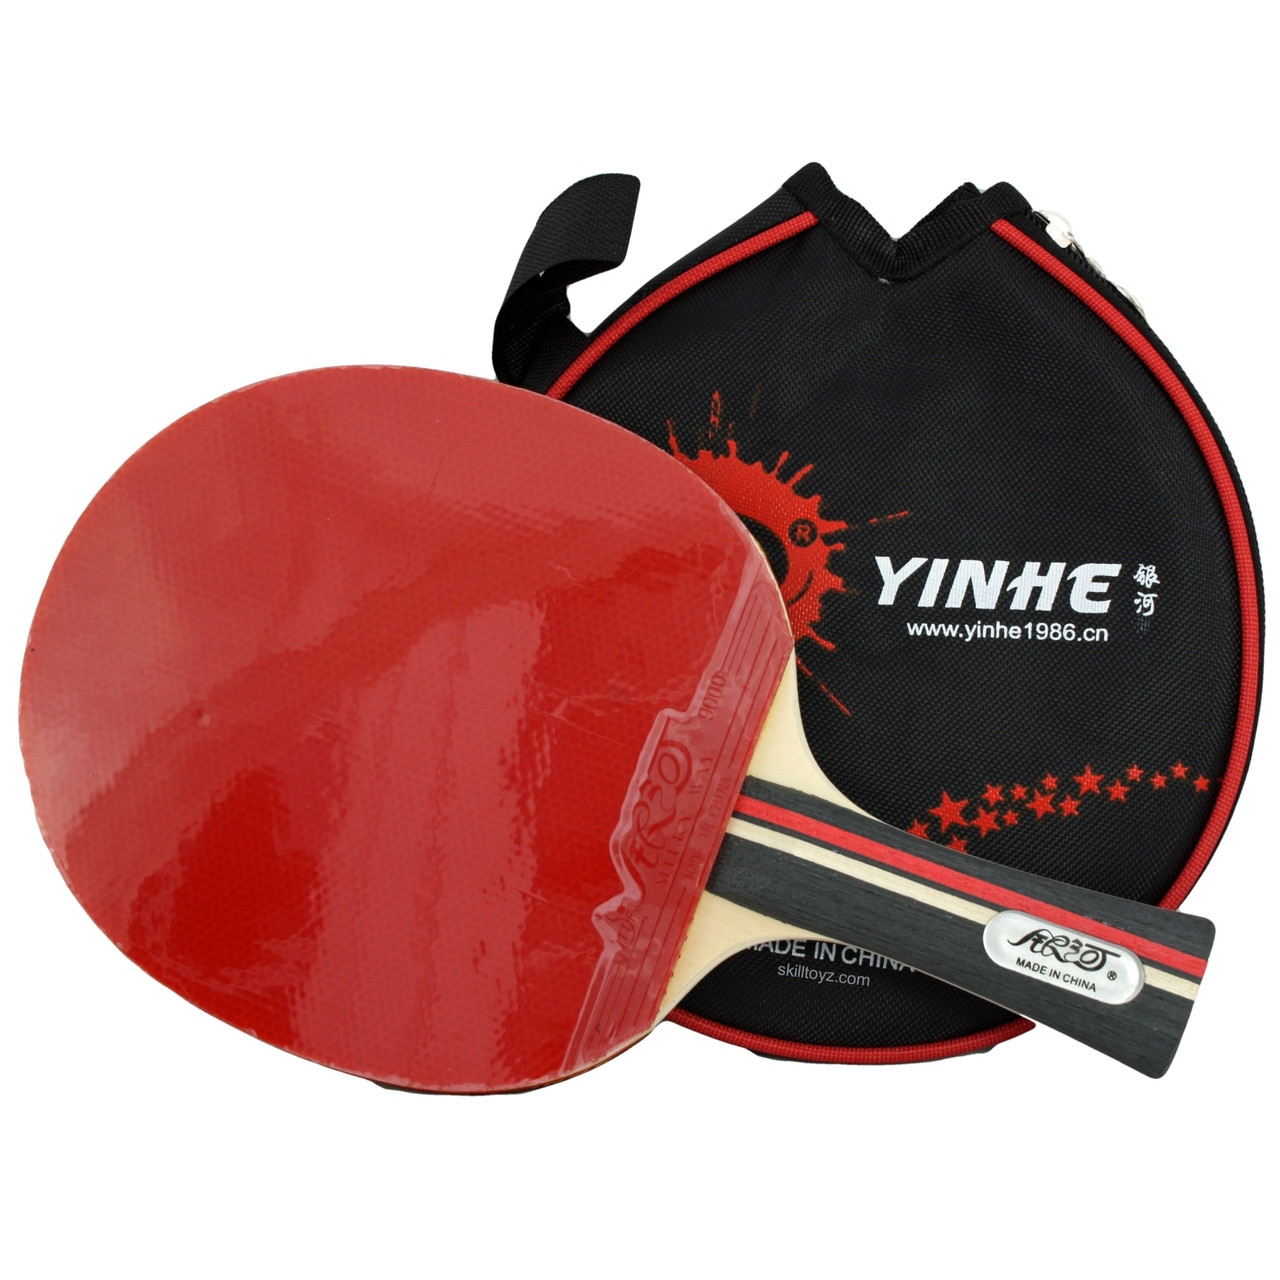 Pleasant Yinhe Table Tennis Bat Model 01B Black Case Free Rubber Protectors Interior Design Ideas Oteneahmetsinanyavuzinfo